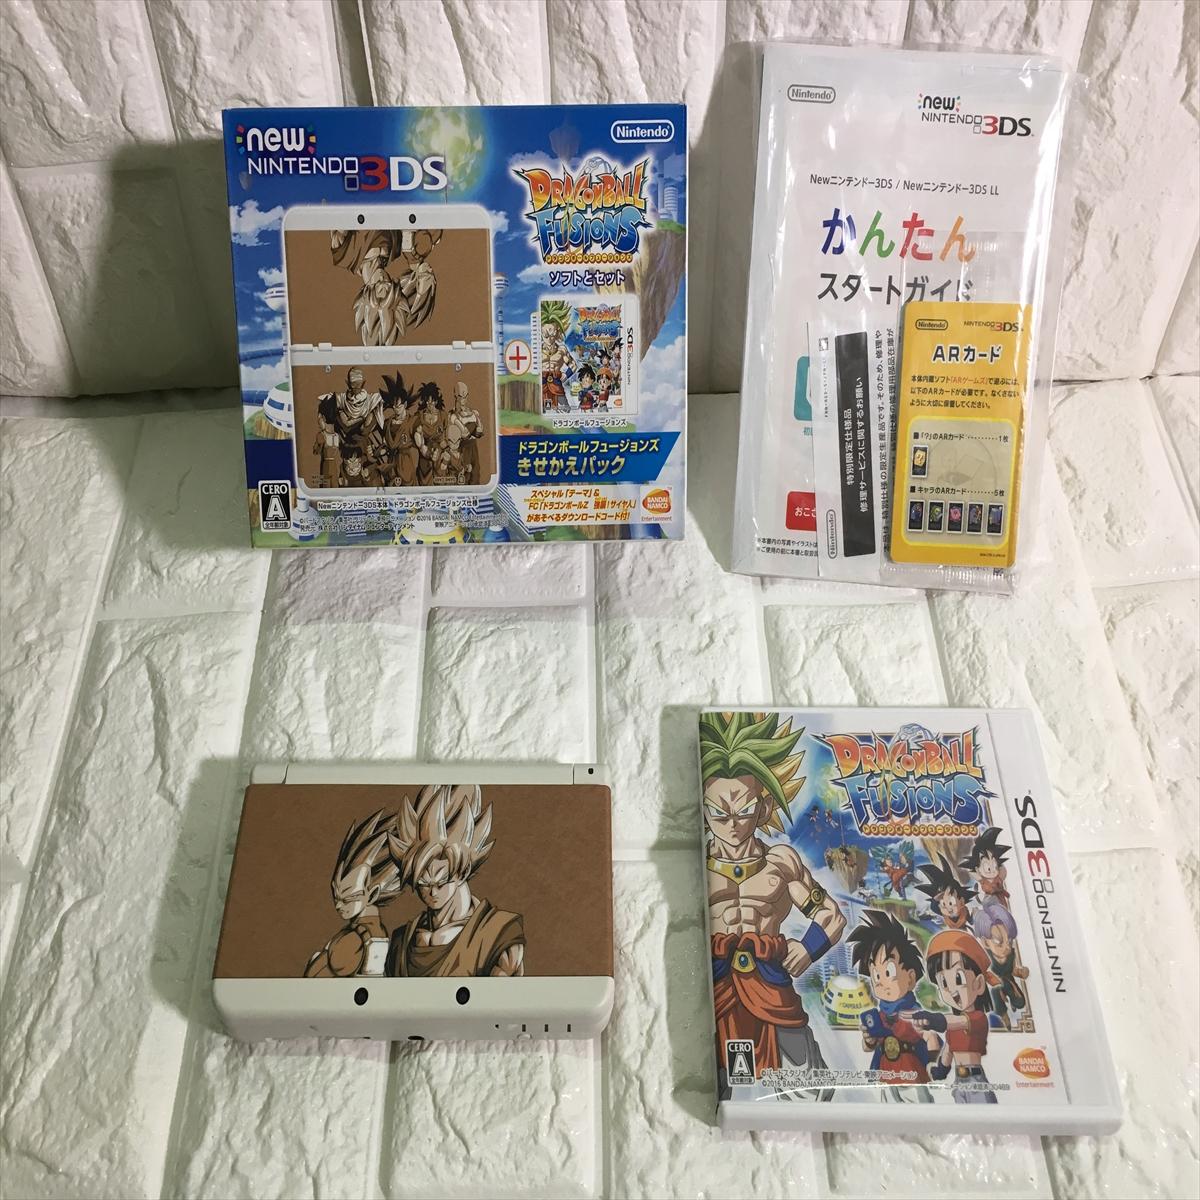 New3DS 本体 ドラゴンボールフュージョンズ きせかえパック ニンテンドー 任天堂 Nintendo ゲーム機 中古 4573173304689 送料無料